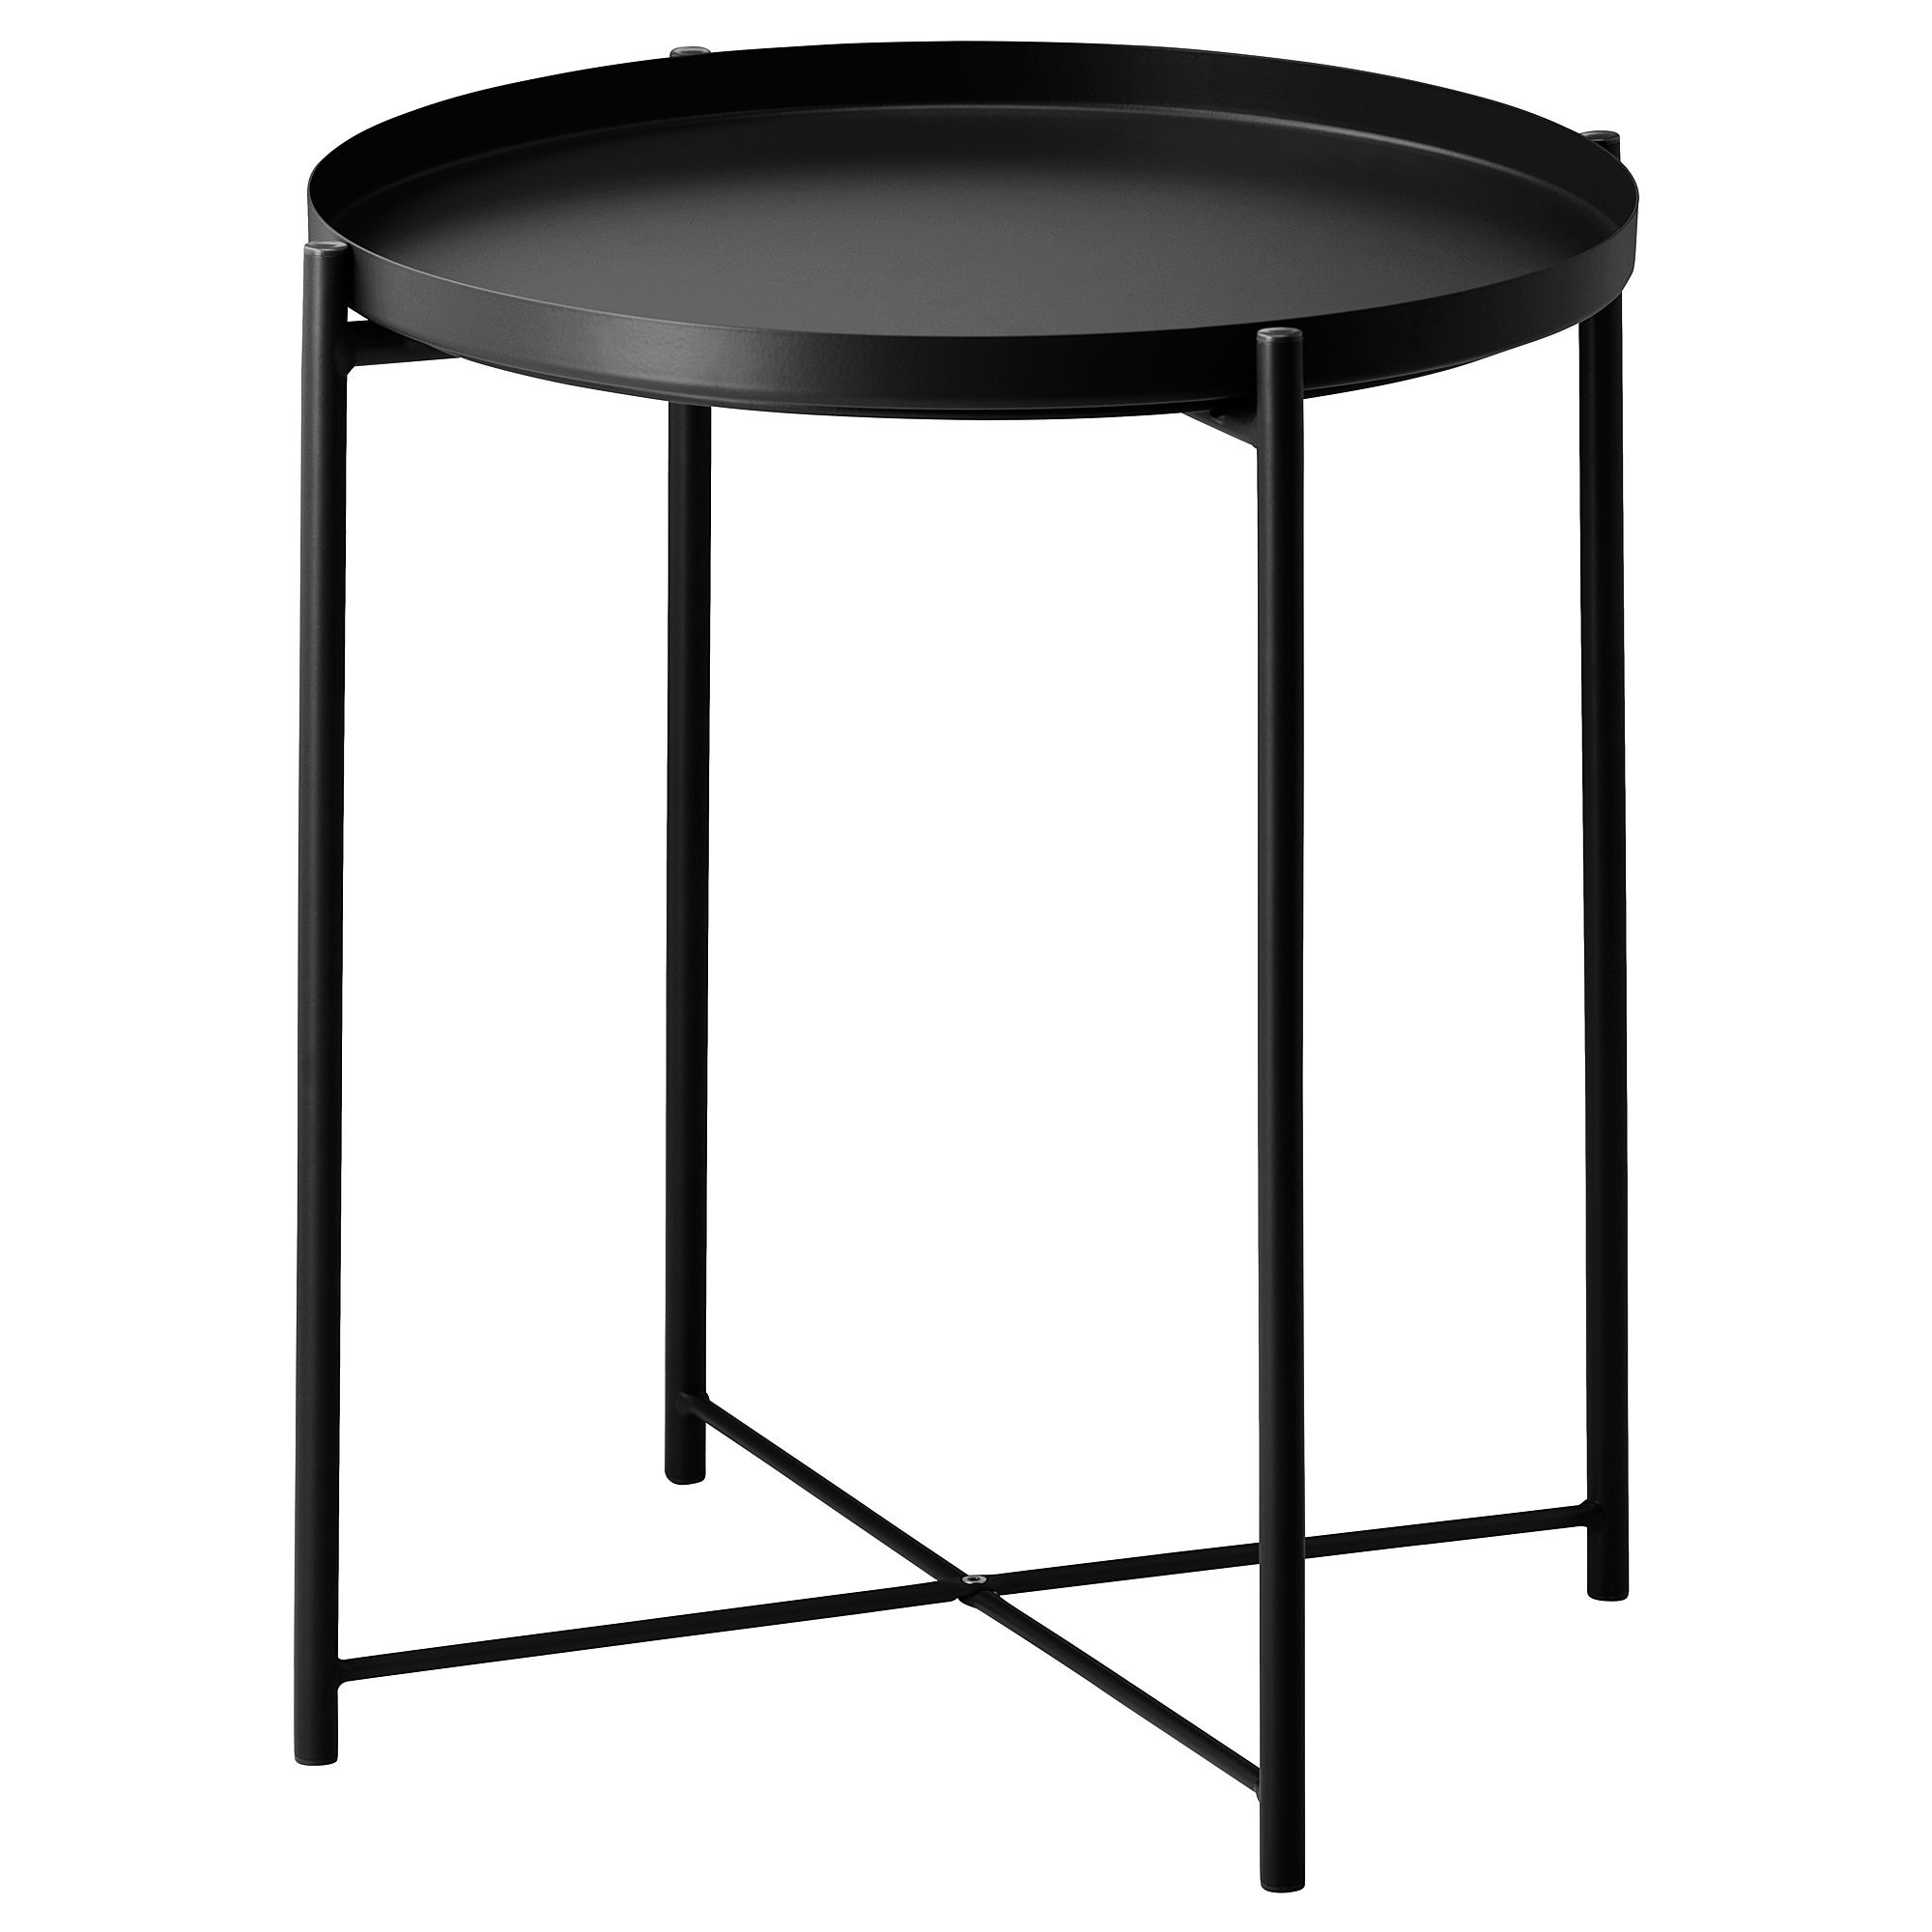 Gladom Tray Table Black 17 1 2x20 5 8 Ikea Side Table Black Side Table Tray Table